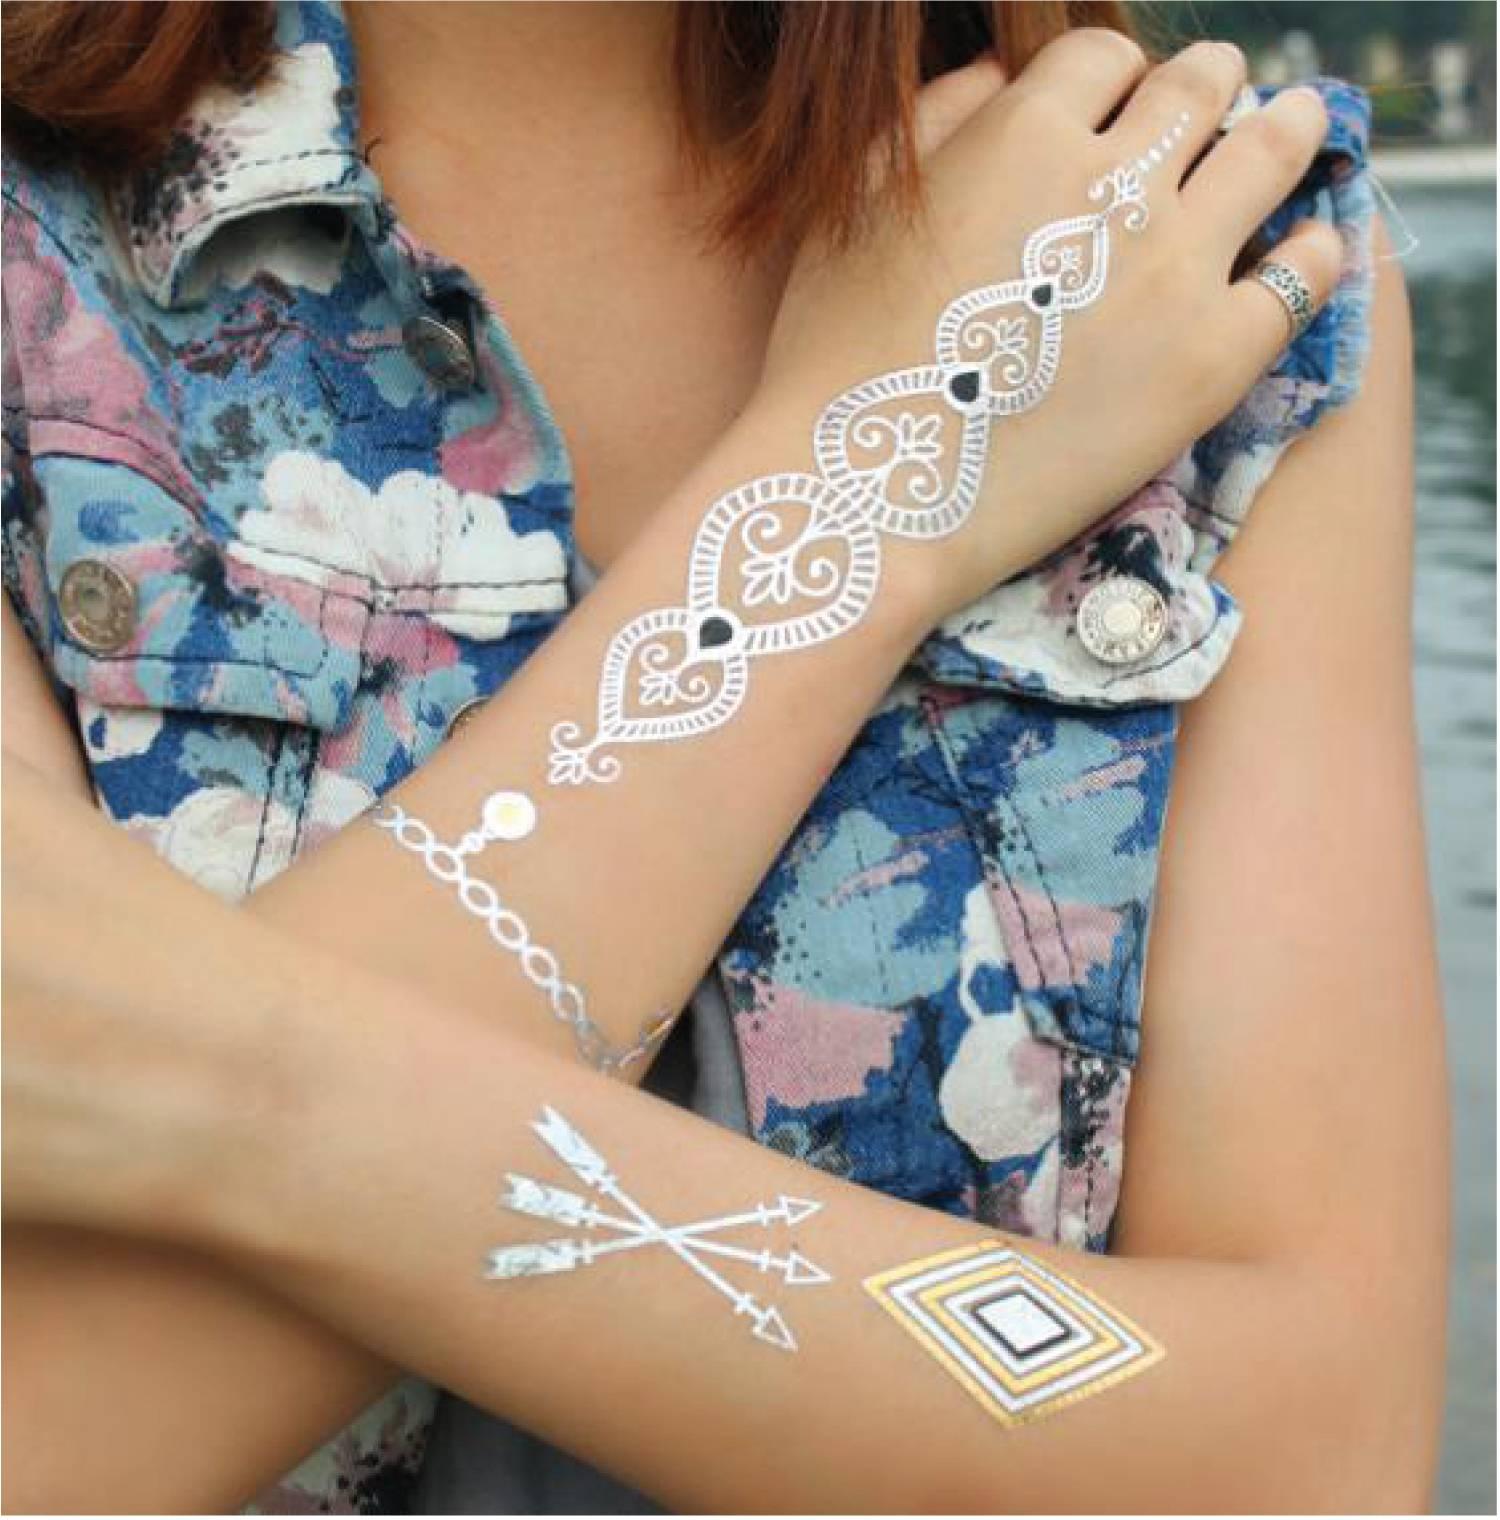 personnalise-temporaire-remarquer-tatouage-faites